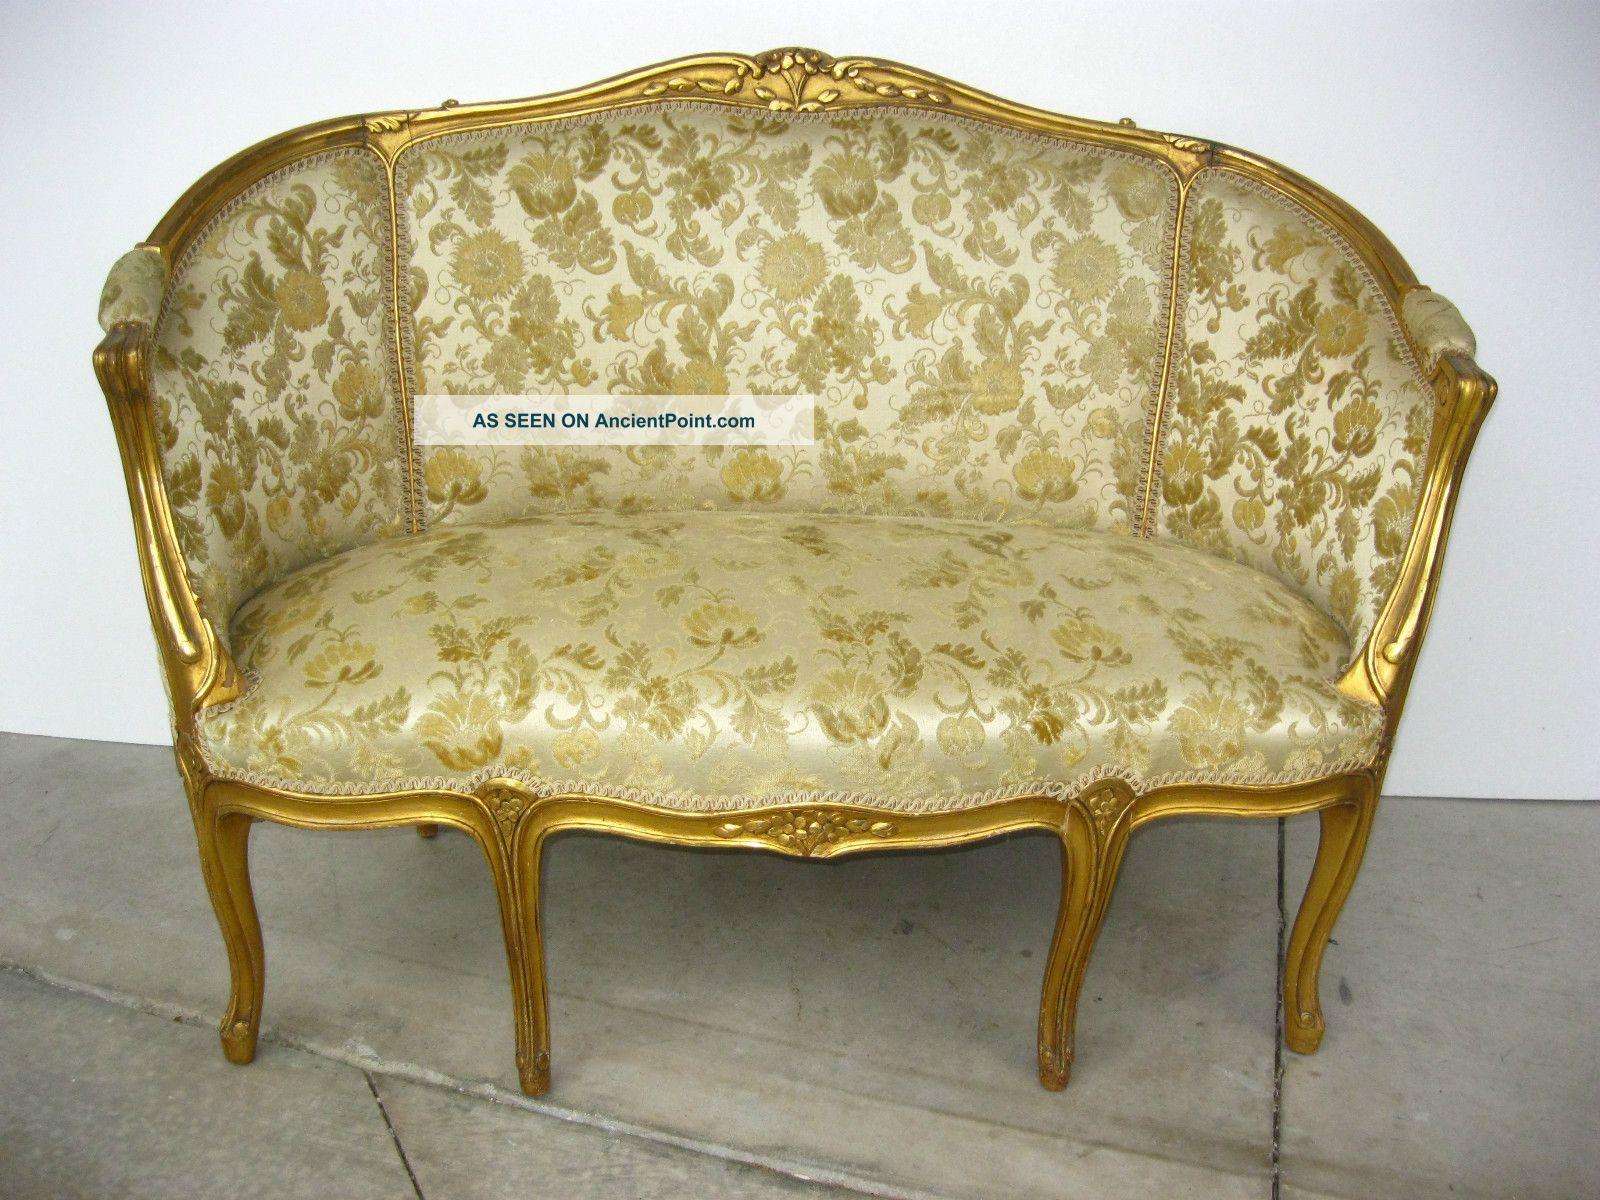 Vintage French Provincial Style Gold Gilt Gold Floral Velvet Fabric